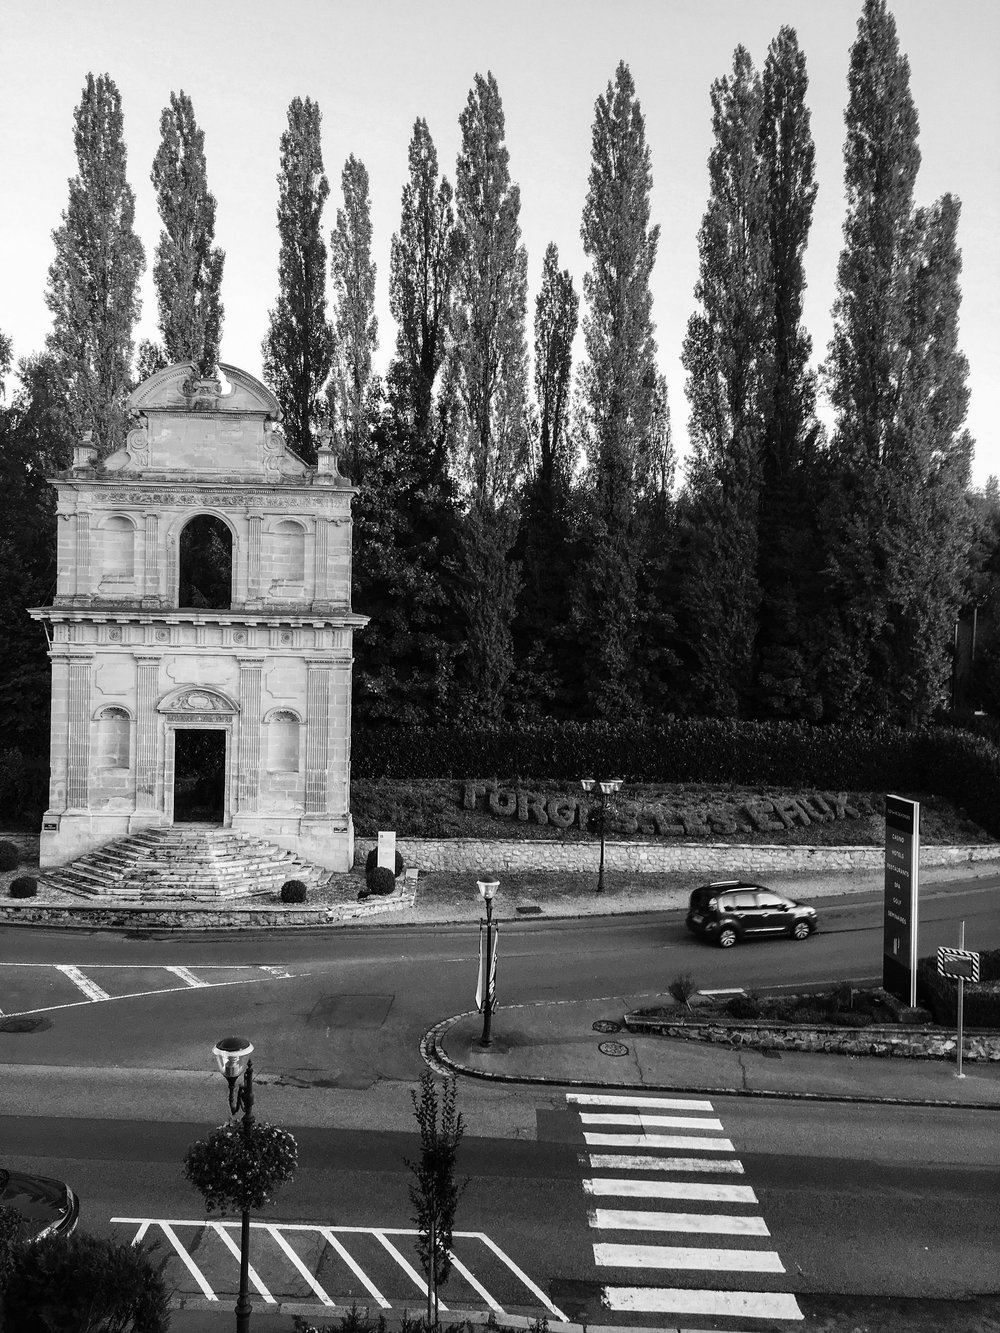 Tom_Oliver_Payne_London_to_Paris_Cycle-40.jpg